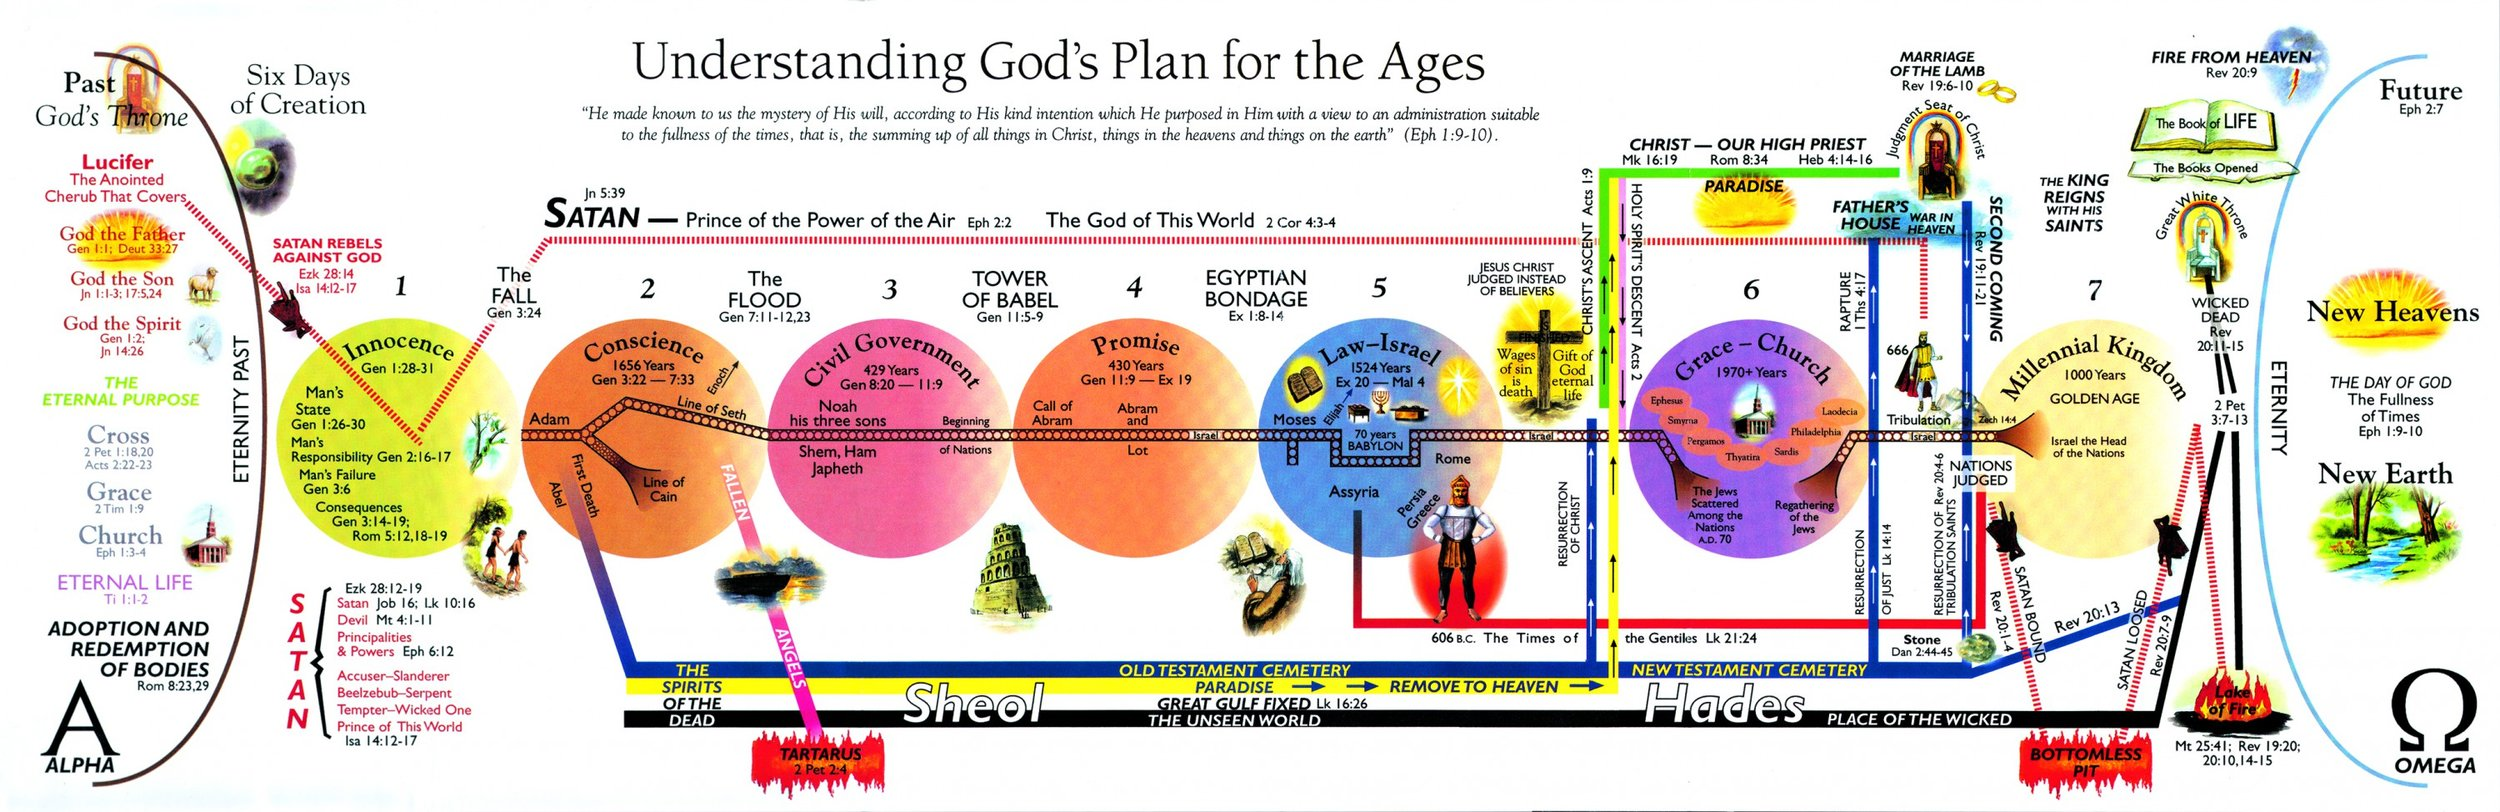 CHART-LaHaye-Gods-Plan-for-the-Ages-MED-RESO-1.jpg